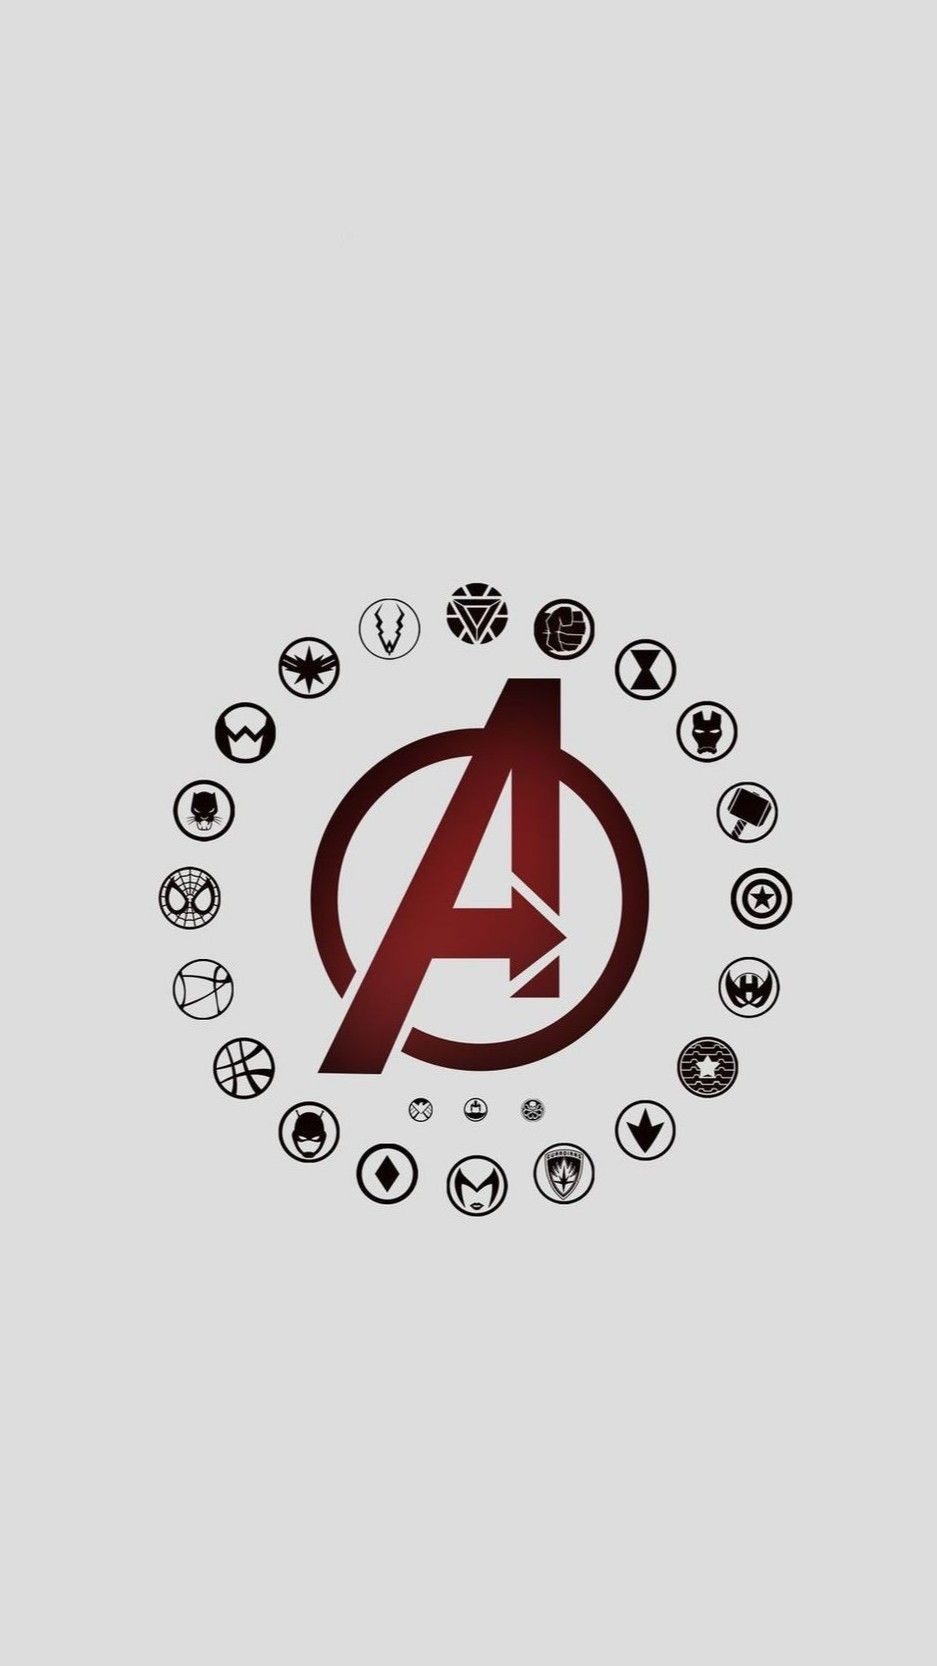 Fondos Para El Iphone Fondo De Pantalla De Avengers Fondos De